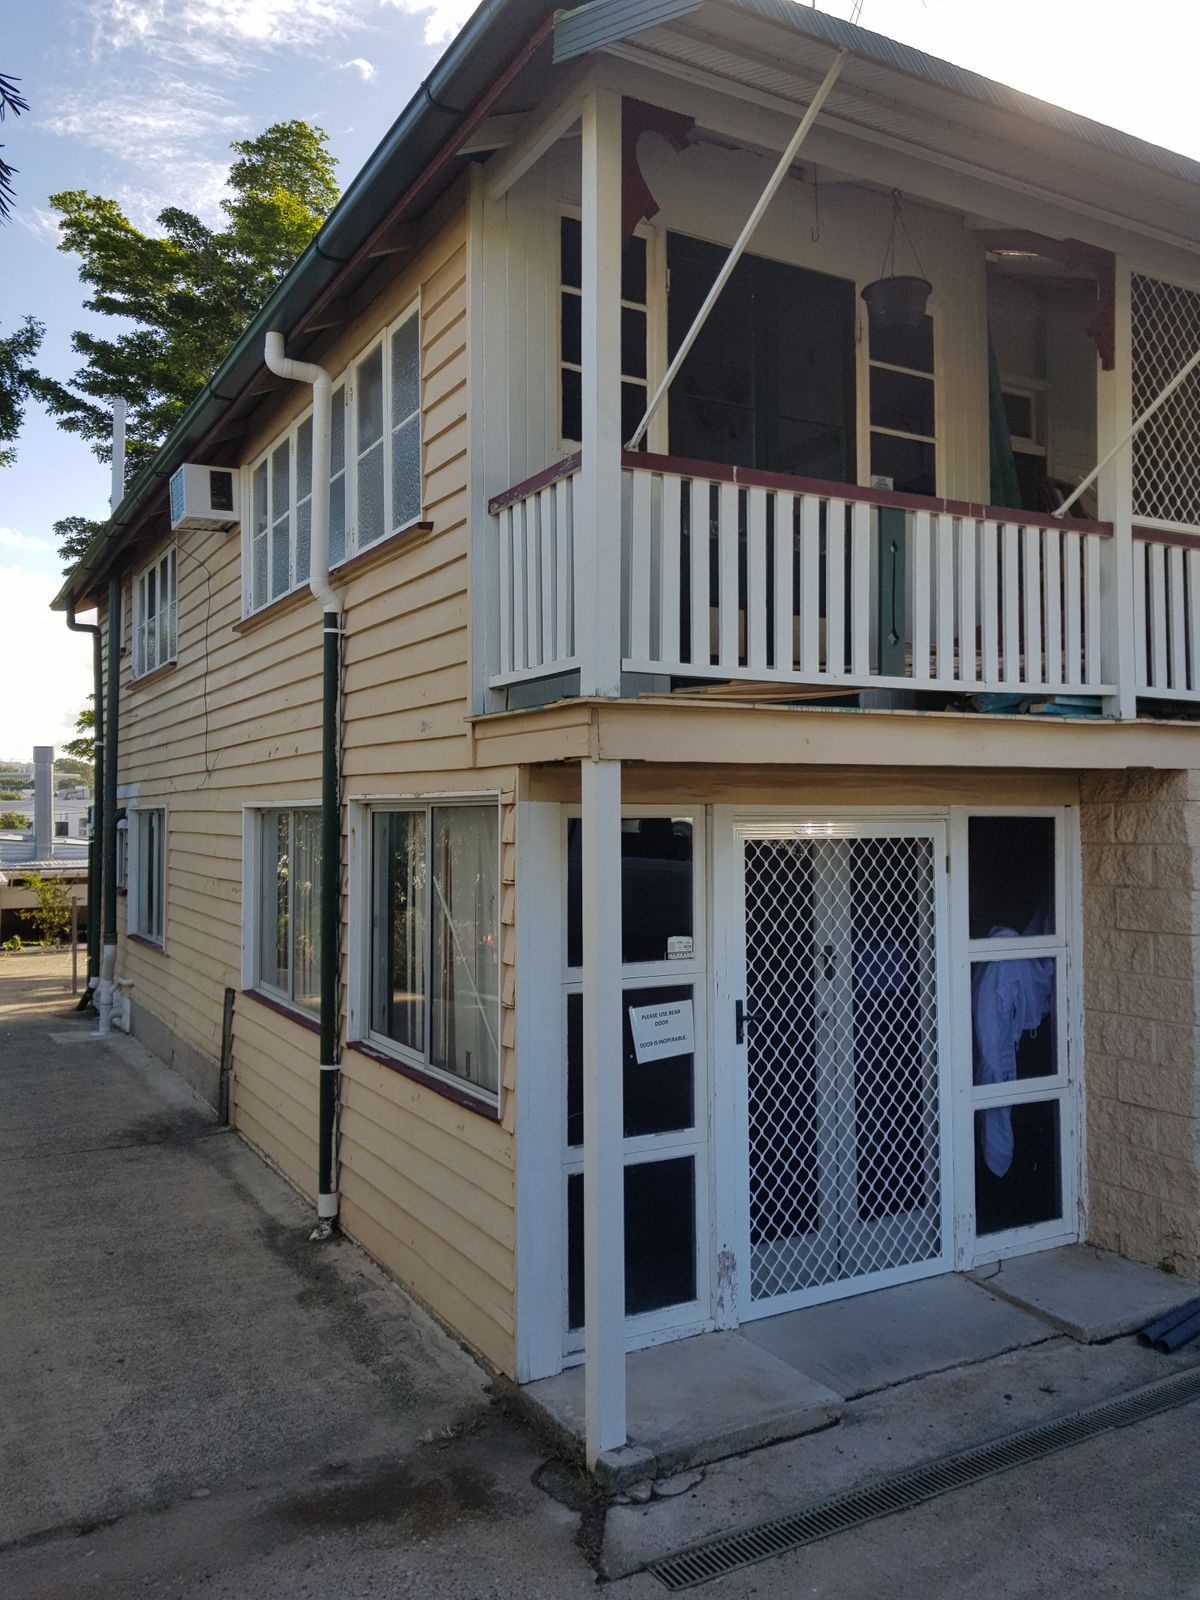 16 Carroll Street, Nambour, QLD 4560